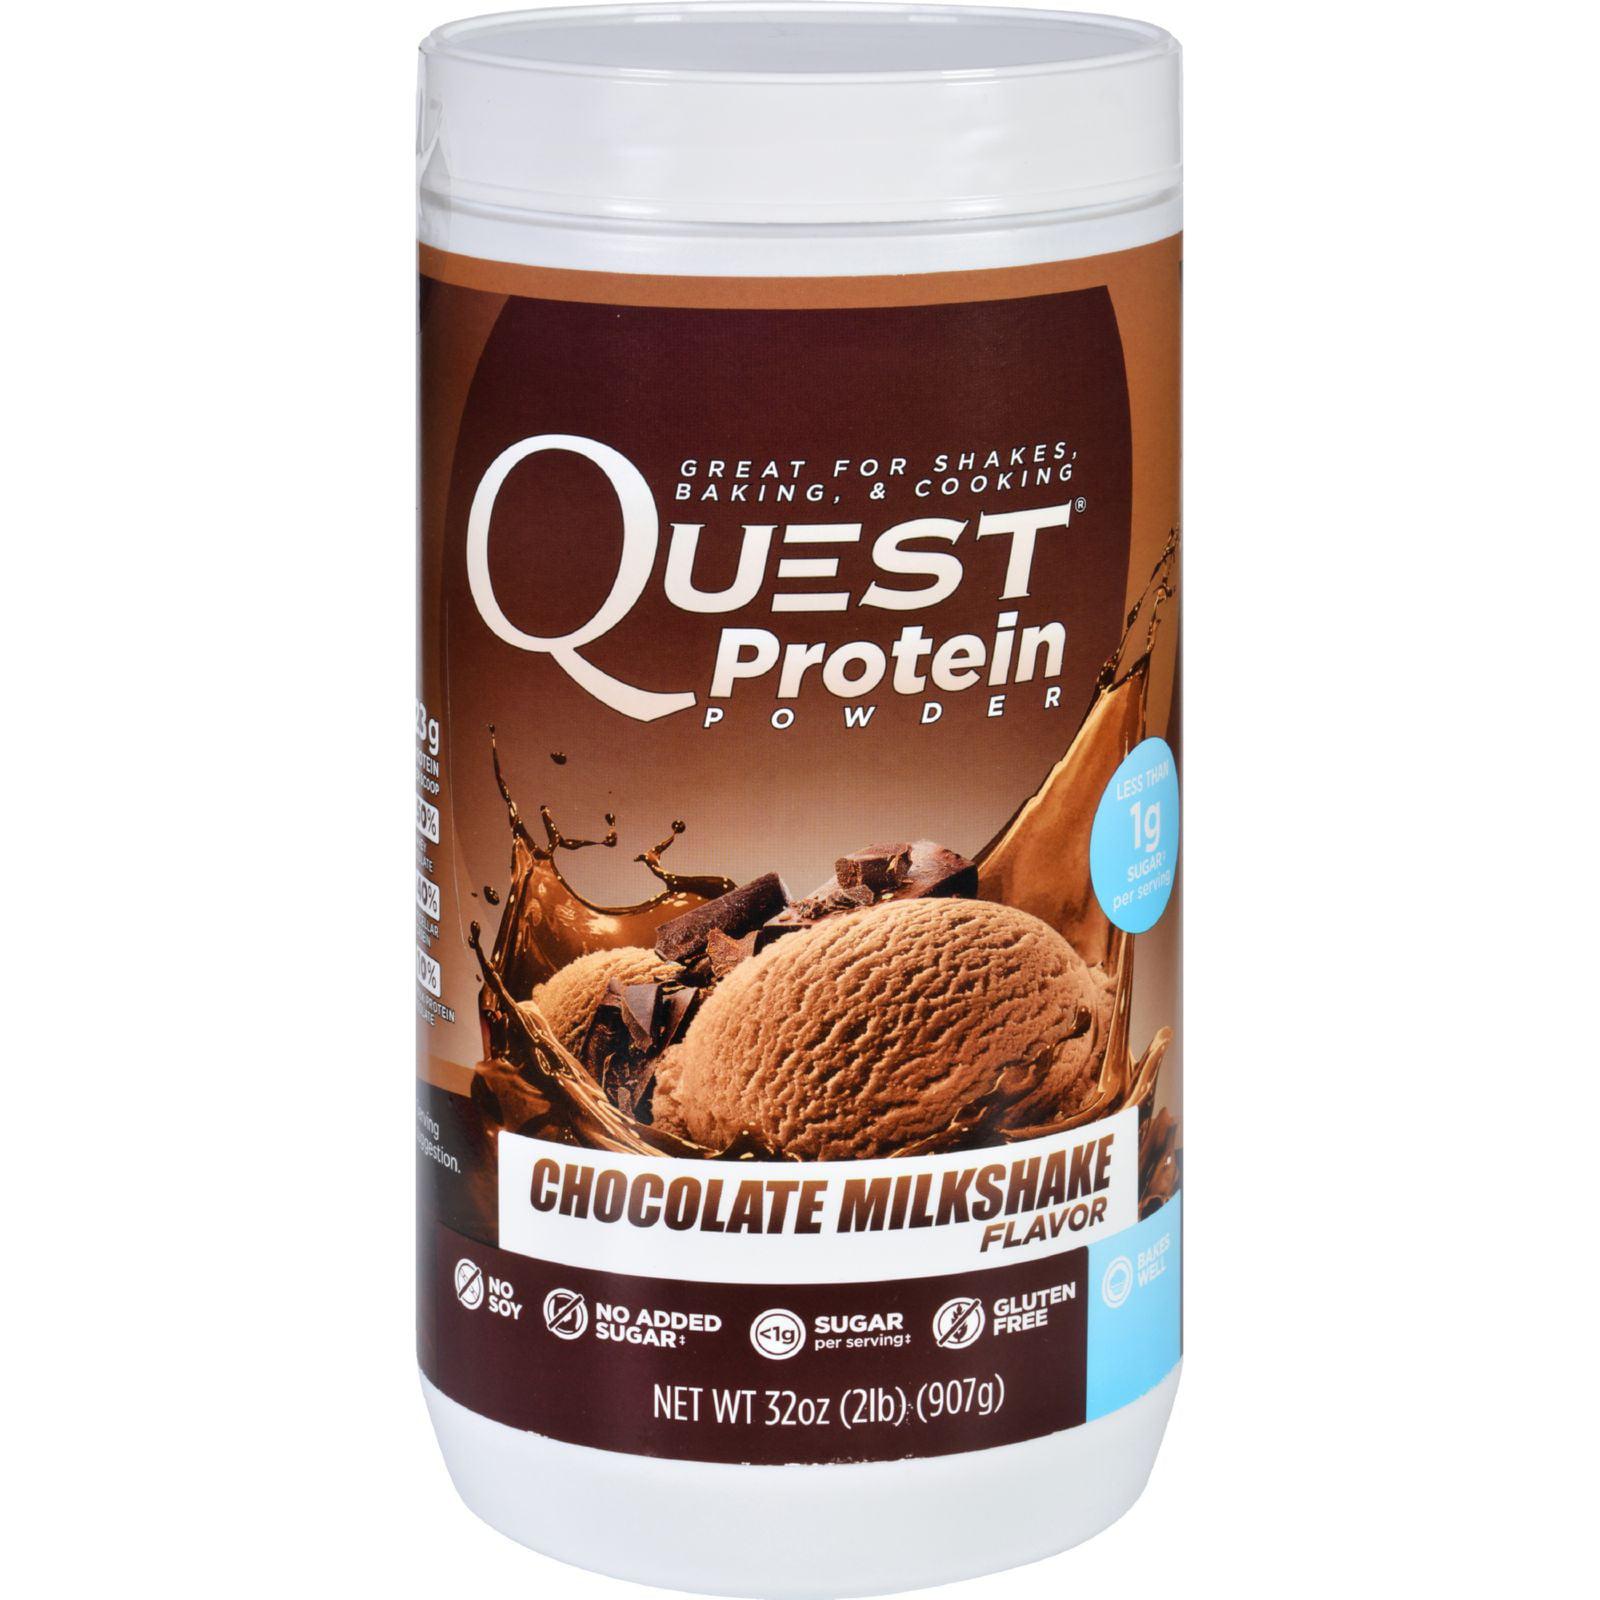 Quest Protein Powder - Chocolate Milkshake - 2 lb